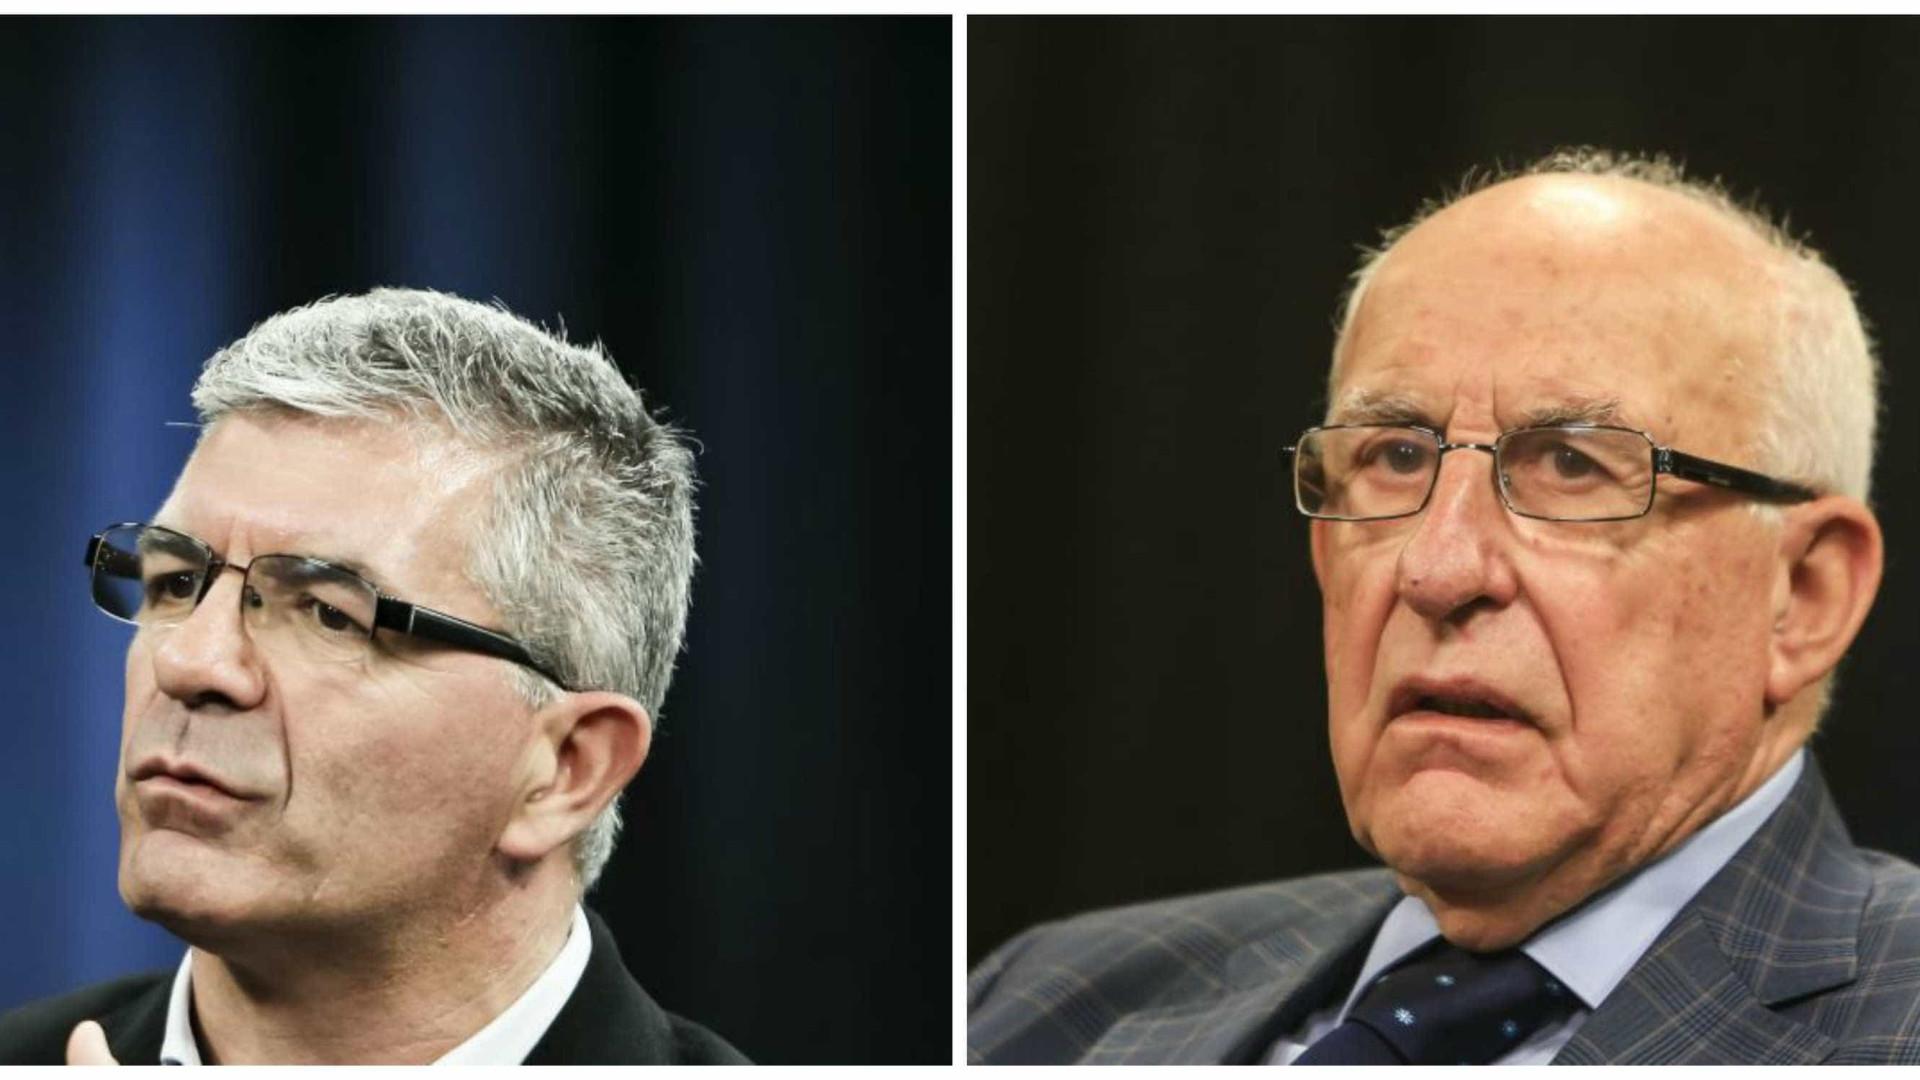 Edgar Silva viabilizaria orçamento, Henrique Neto defende estabilidade